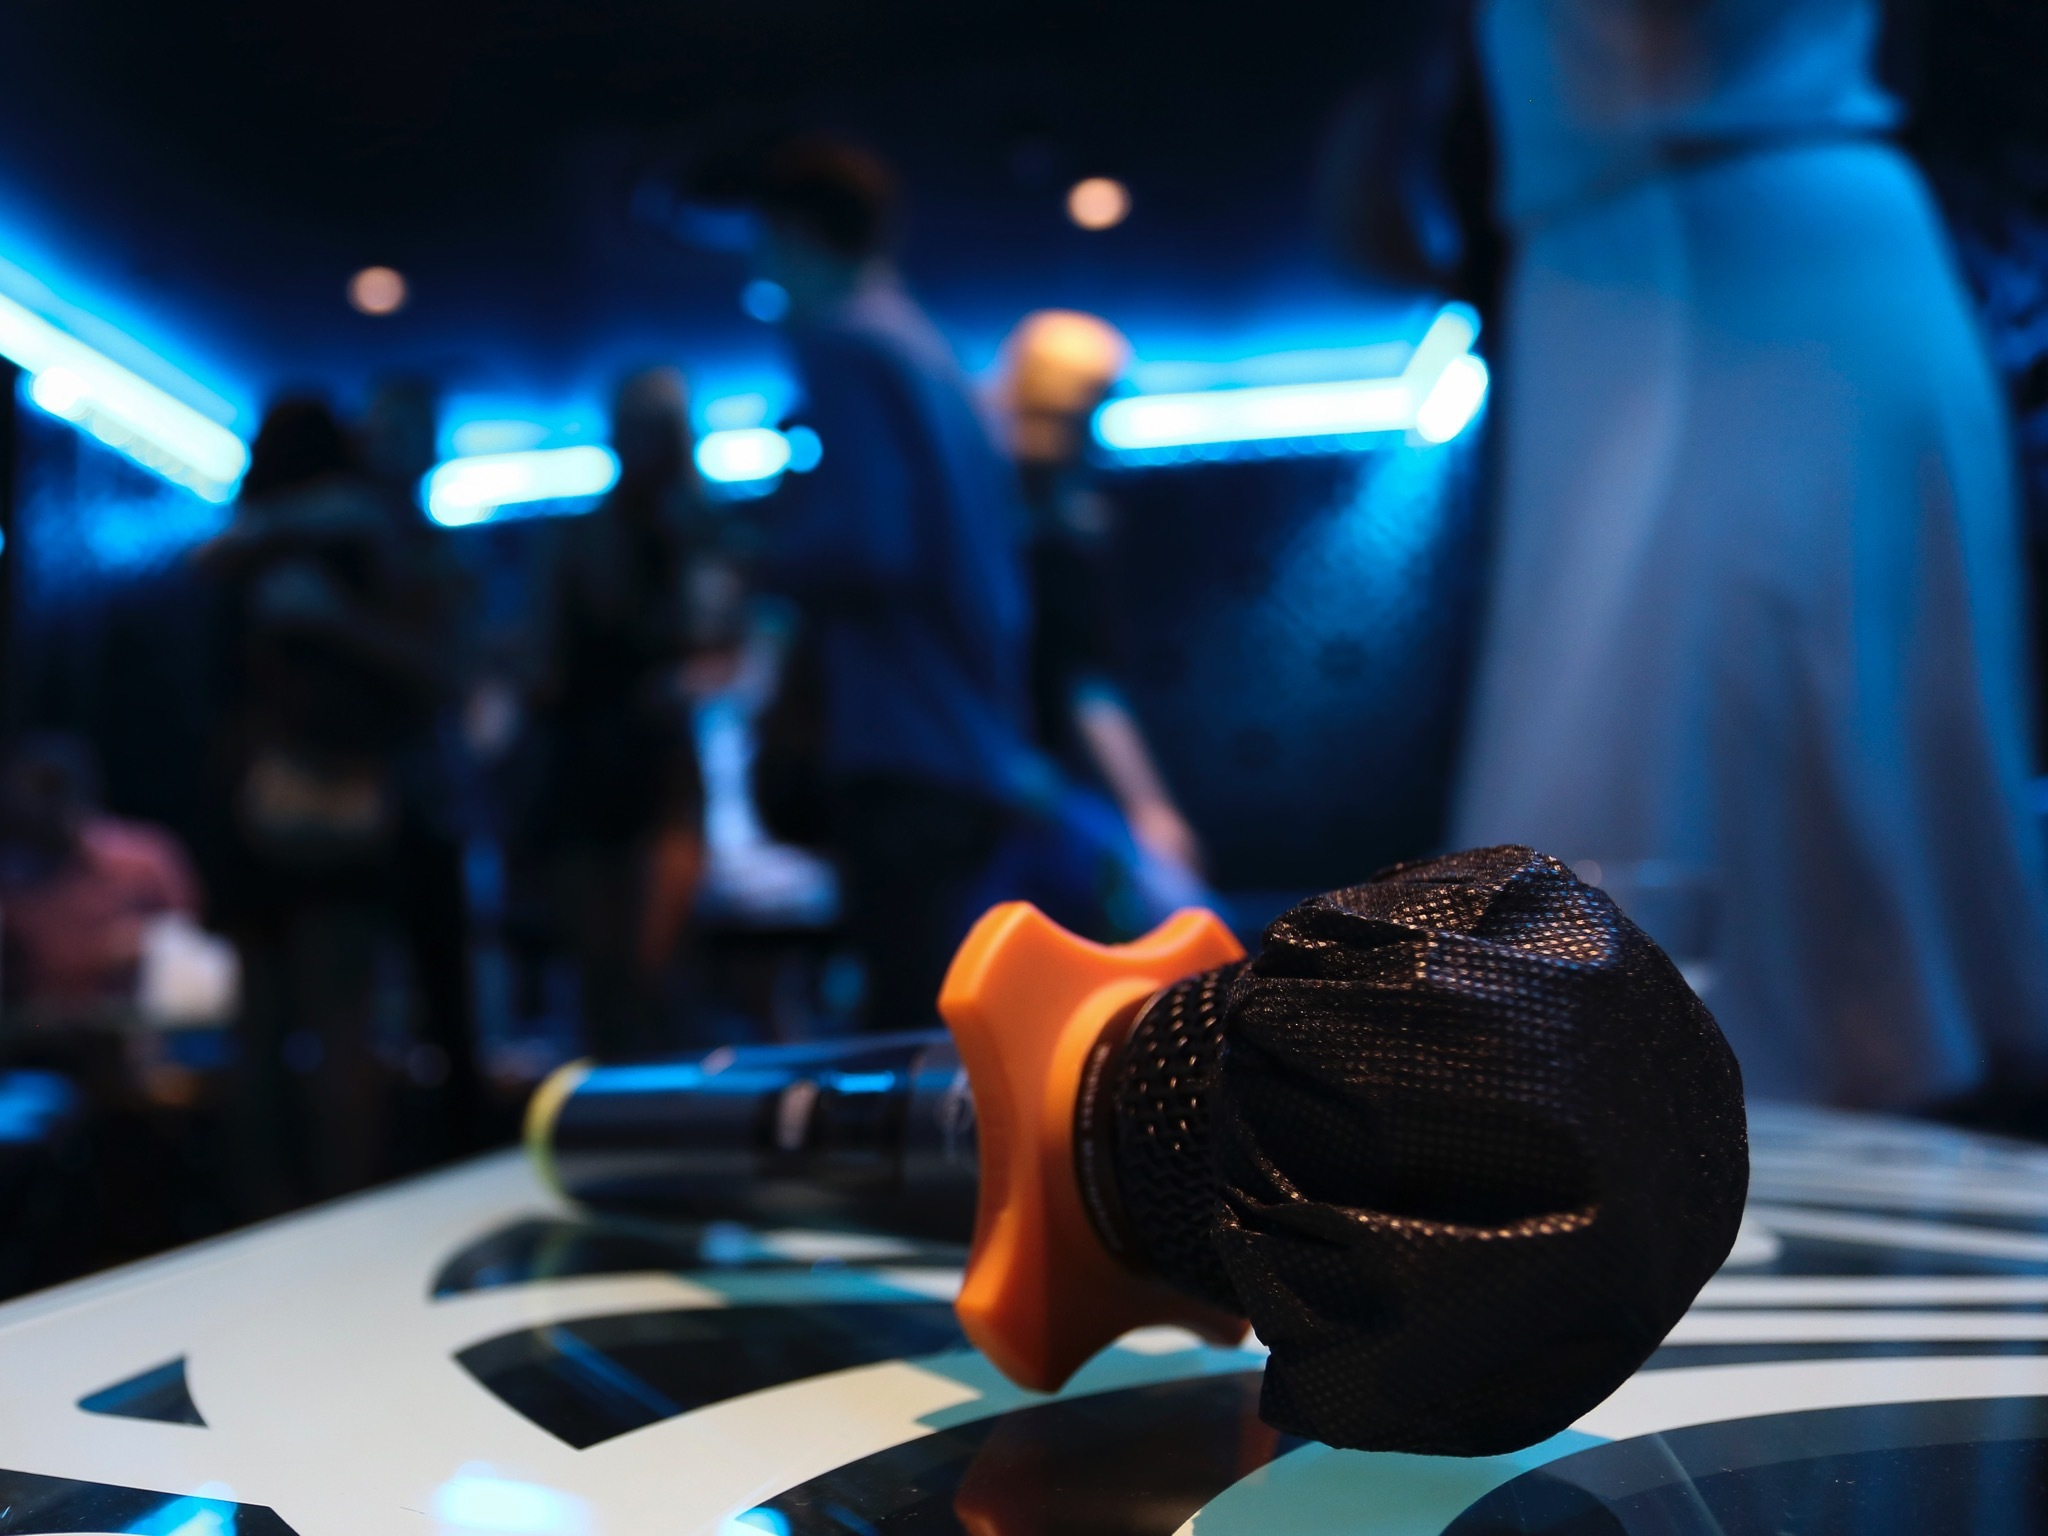 Karaoke microphone on a table